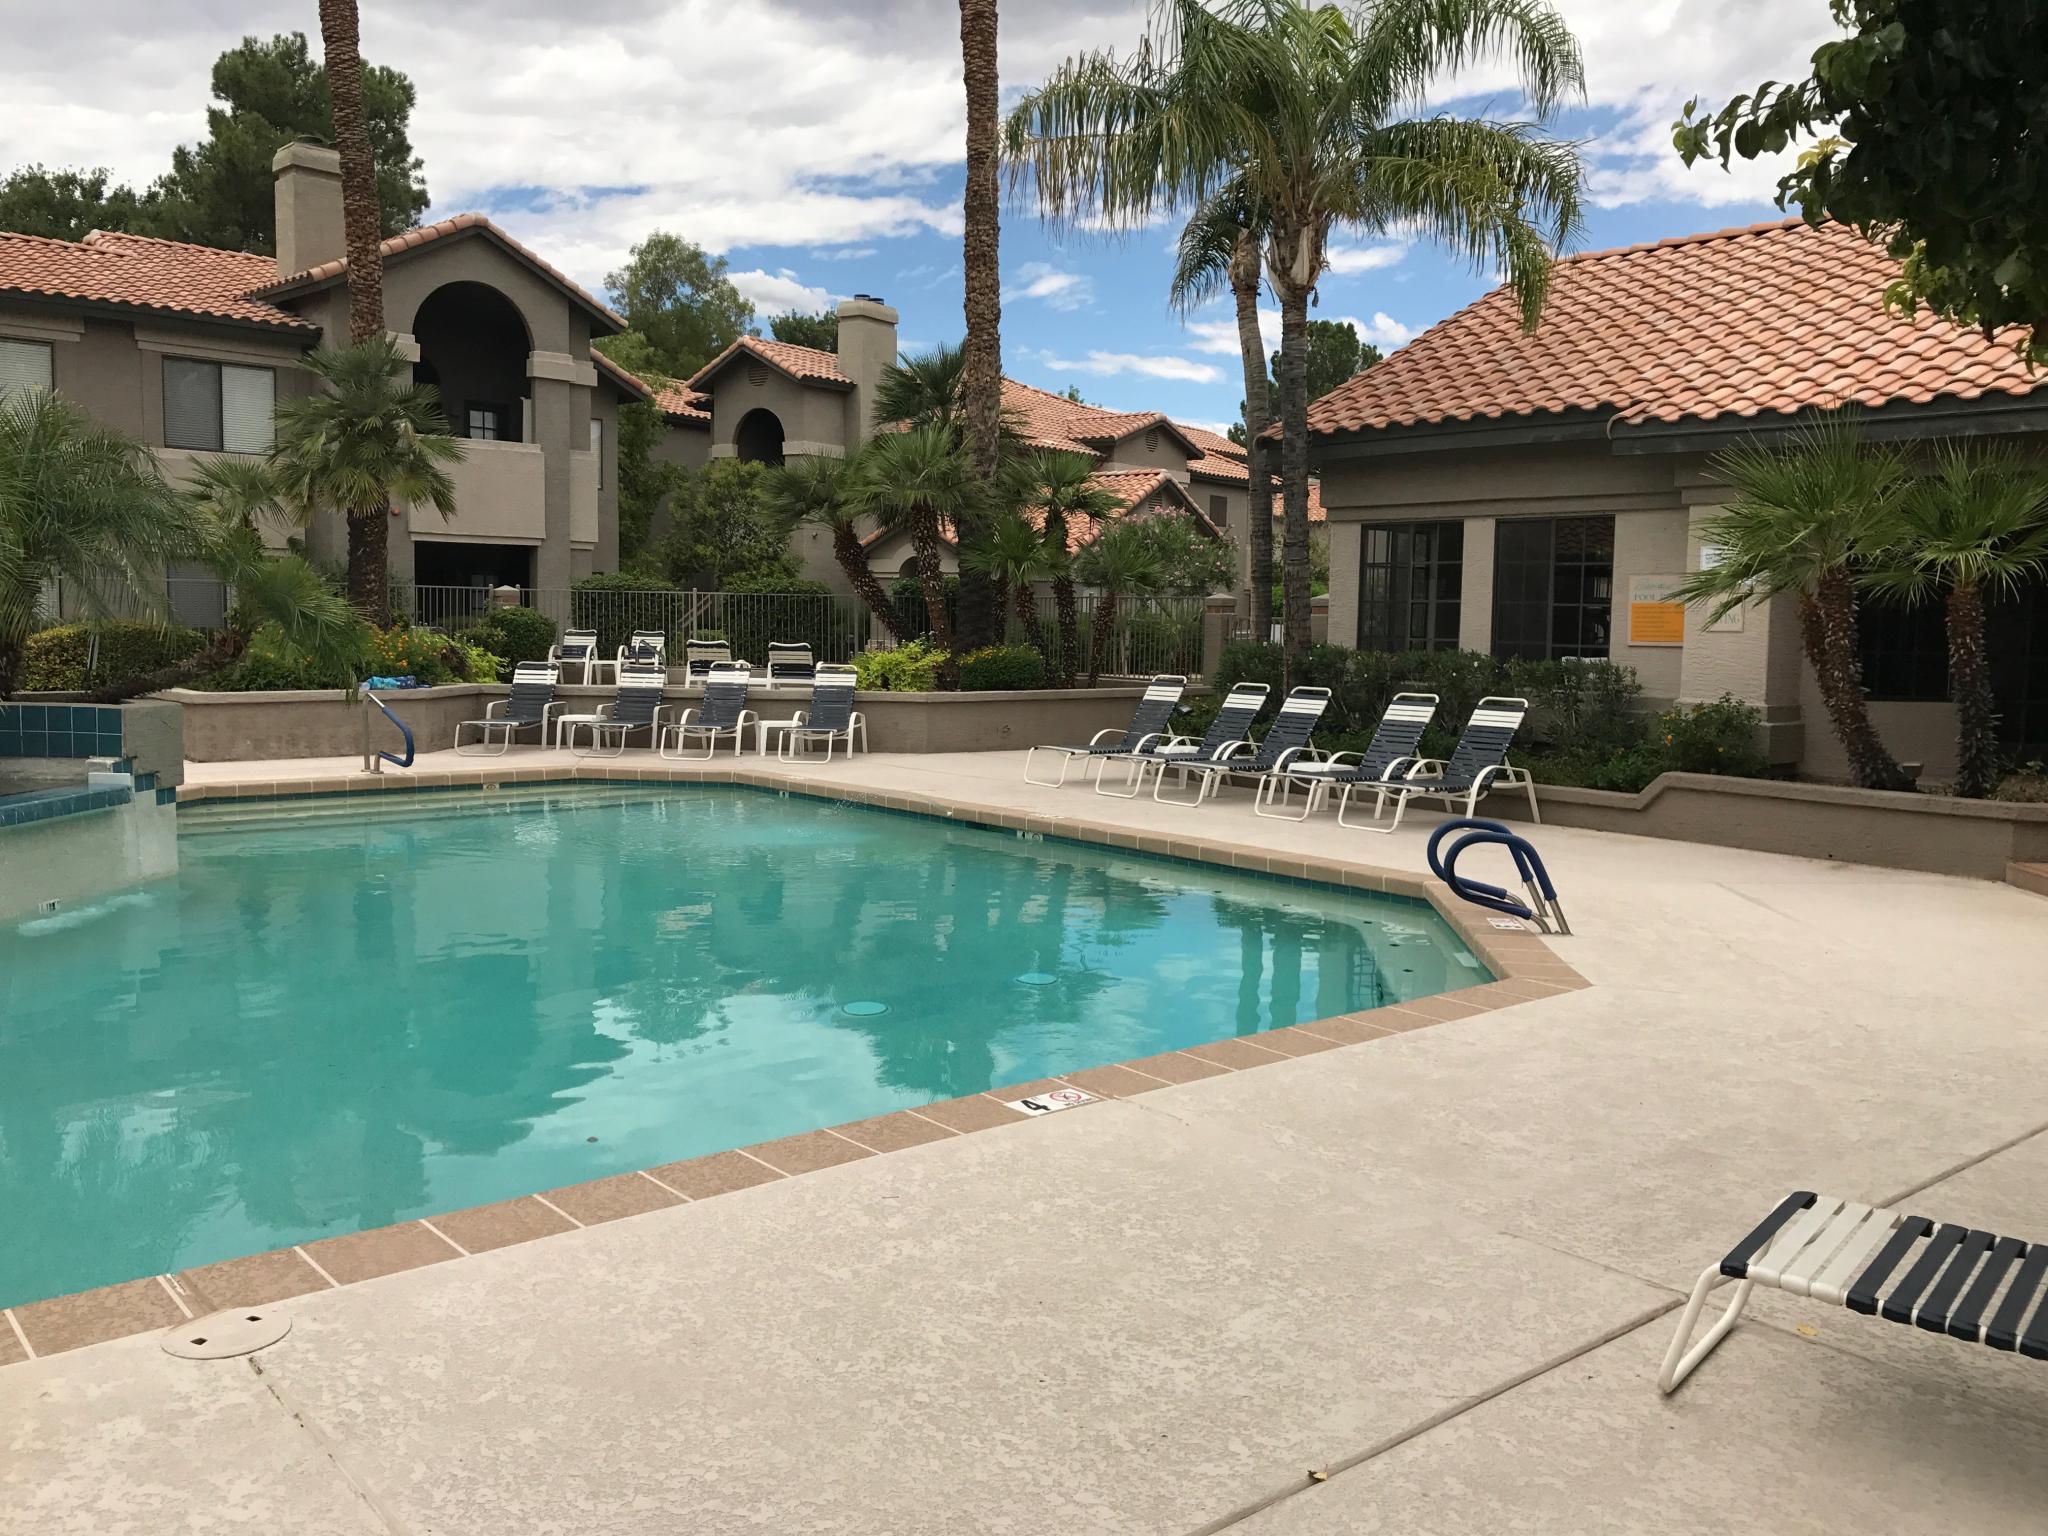 9600 N 96th St #167 For Rent - Scottsdale, AZ | Trulia